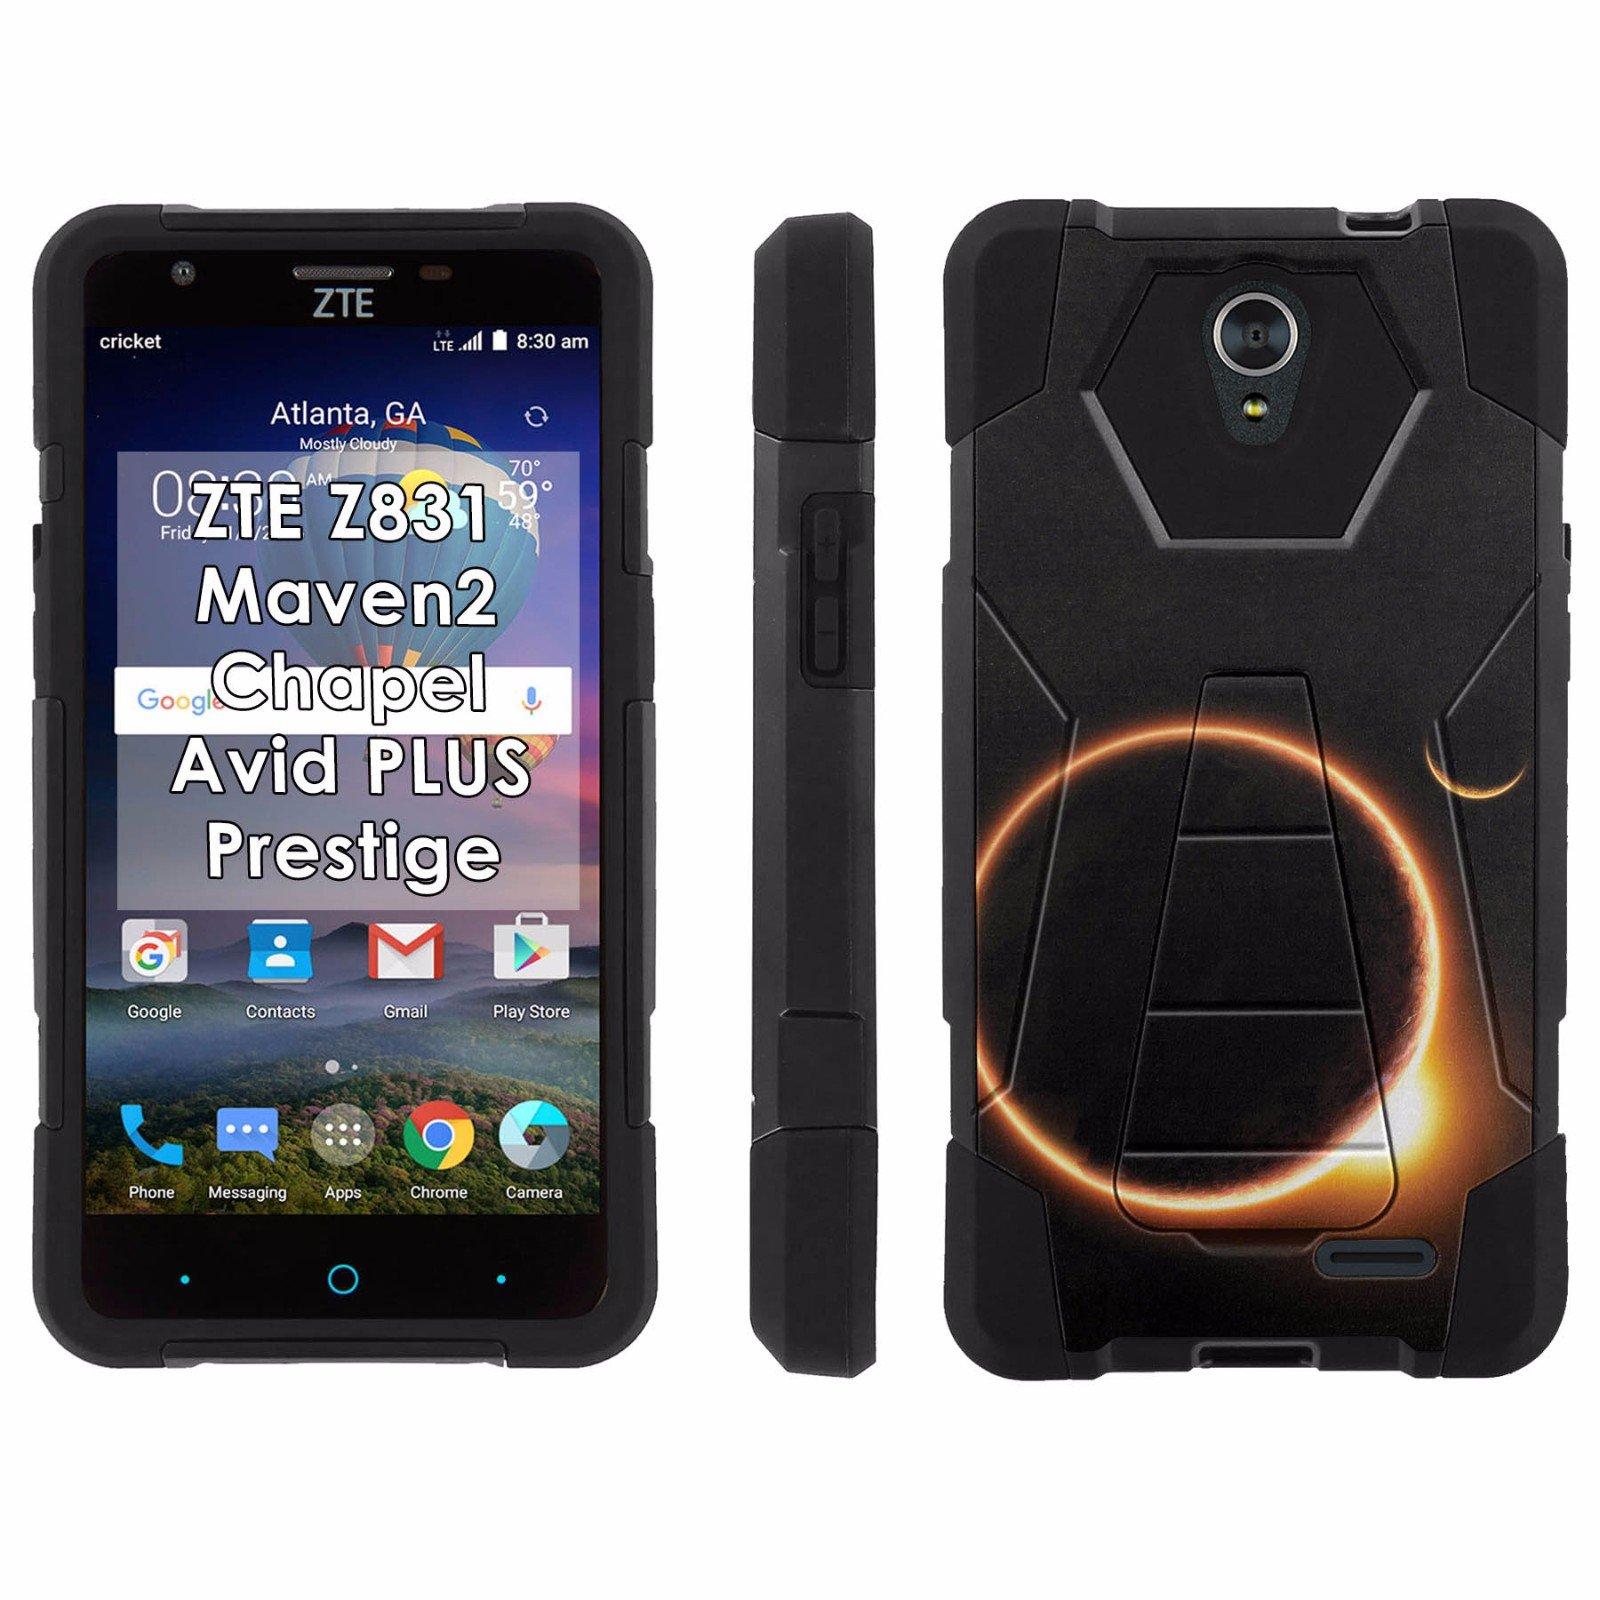 ZTE [Maven 2]Chapel[Prestige][Avid PLUS] Phone Cover, Solar Eclipse - Black Hexo Hybrid Armor Phone Case for ZTE Z831